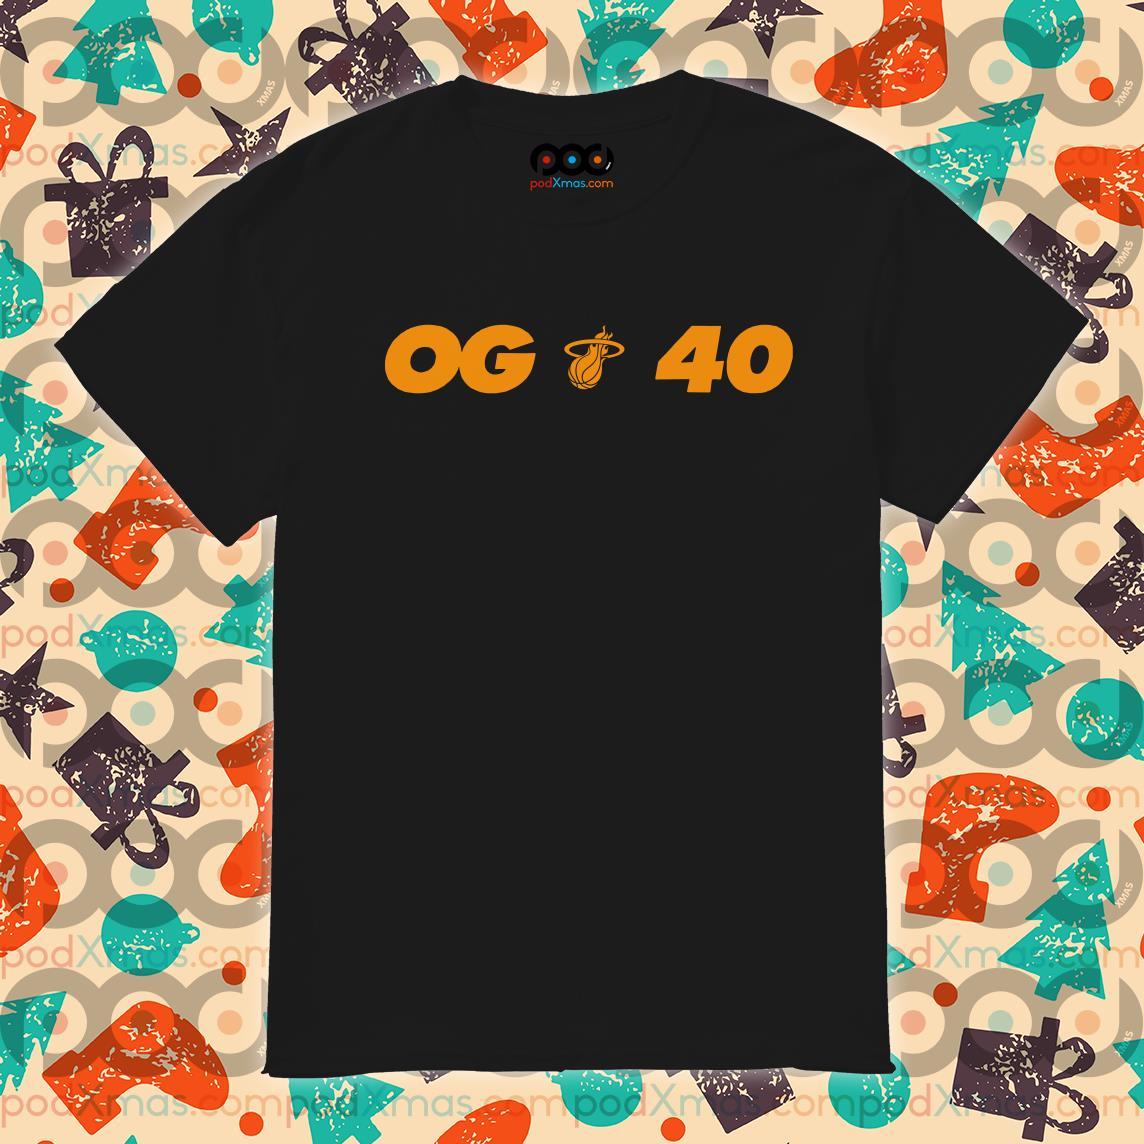 Miami Heat NBA 2019 Champion OG 40 shirt